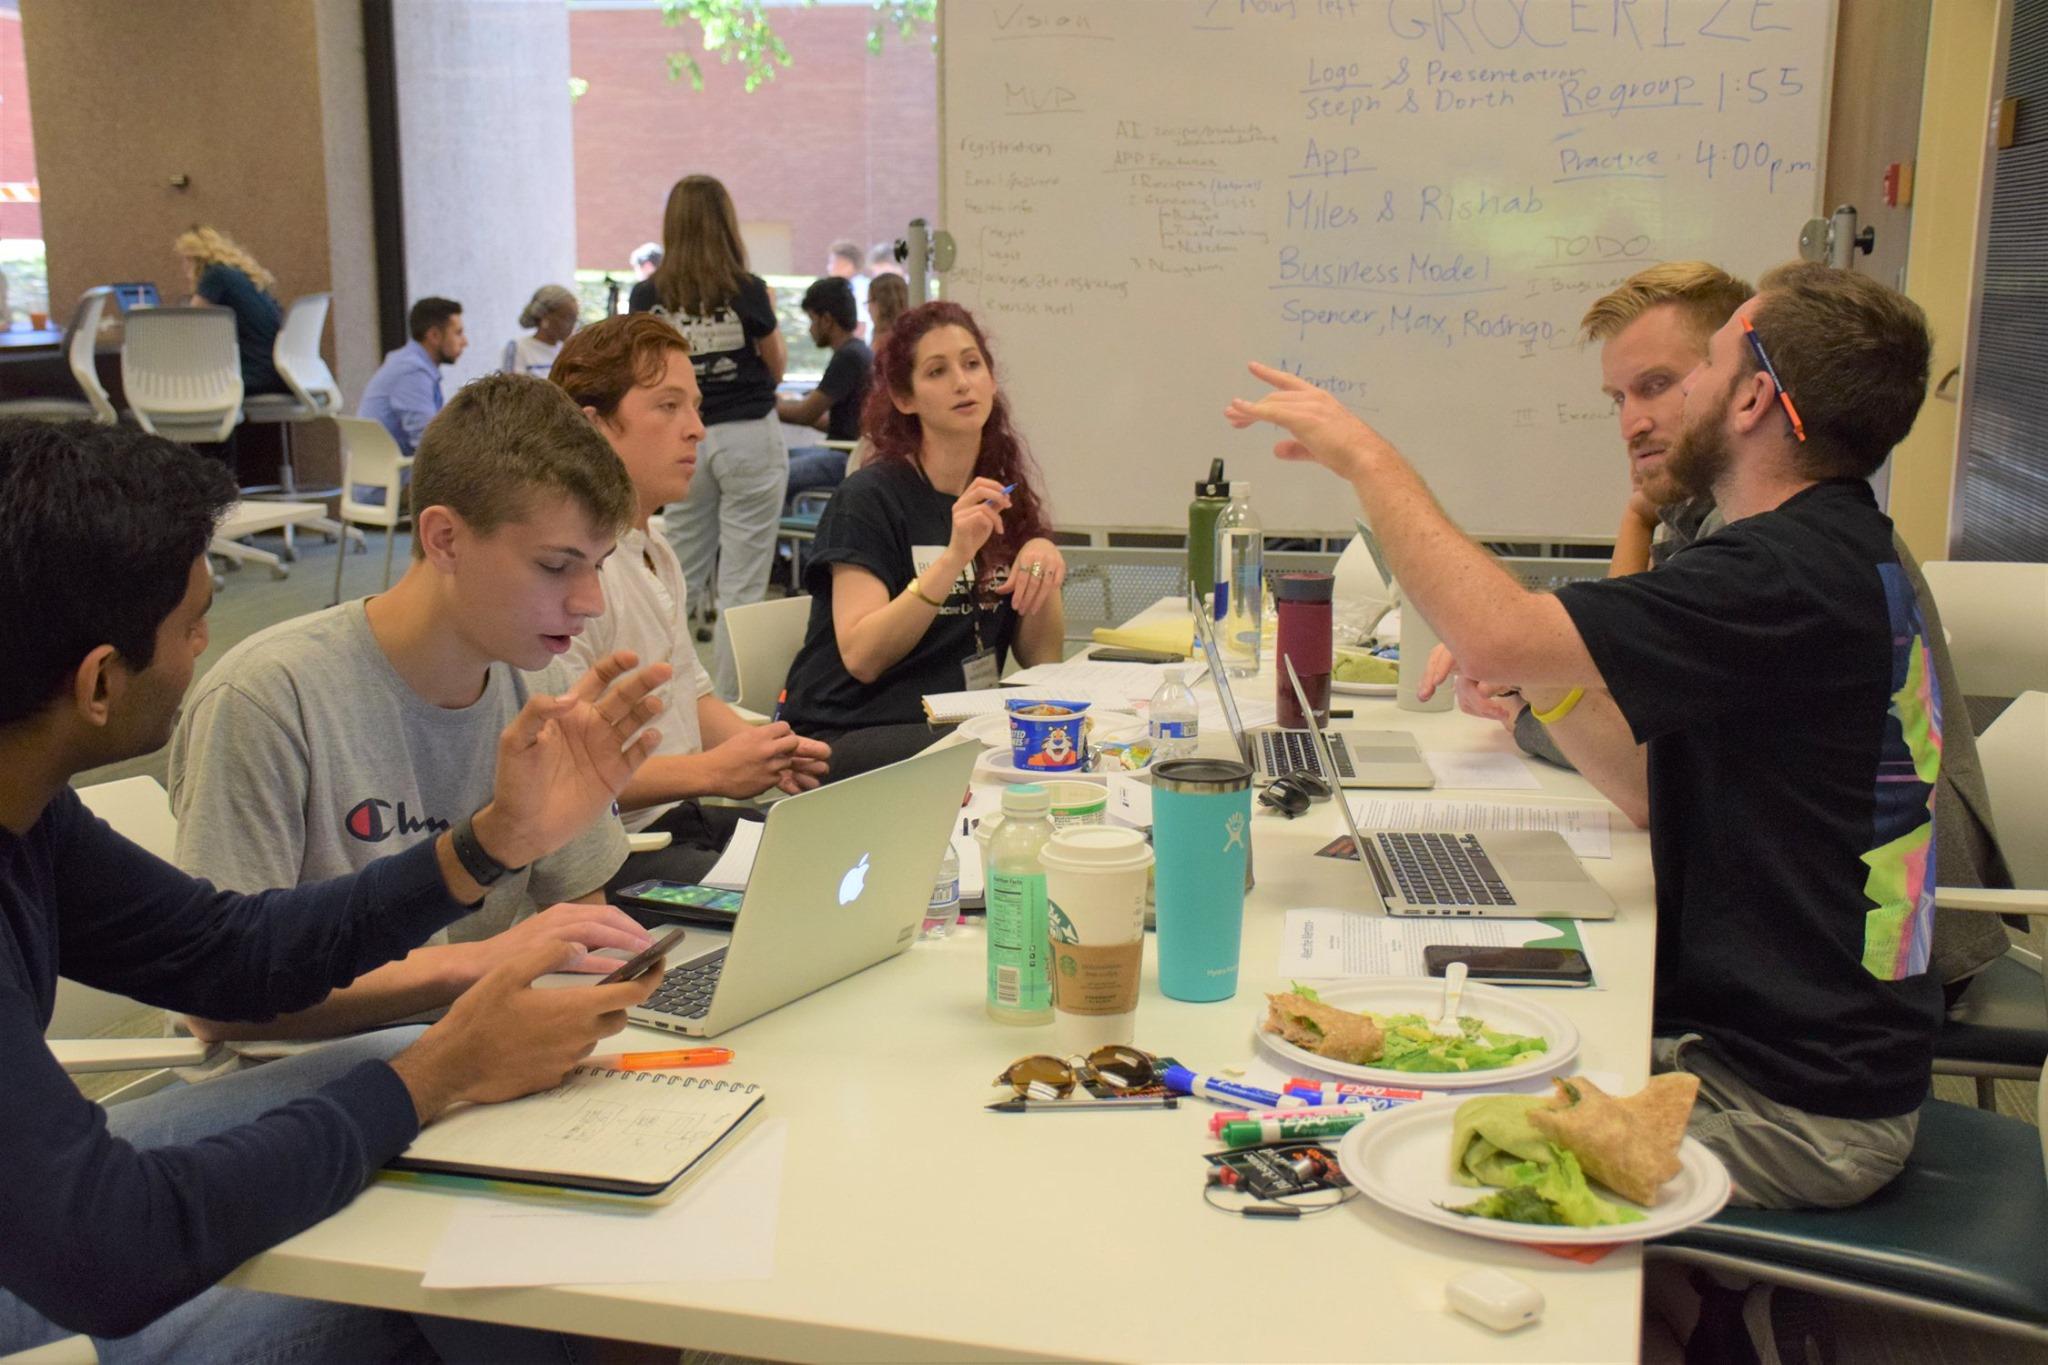 Geena Matuson (@geenamatuson) as mentor with the team behind Grocerize for Startup Weekend, 2019.